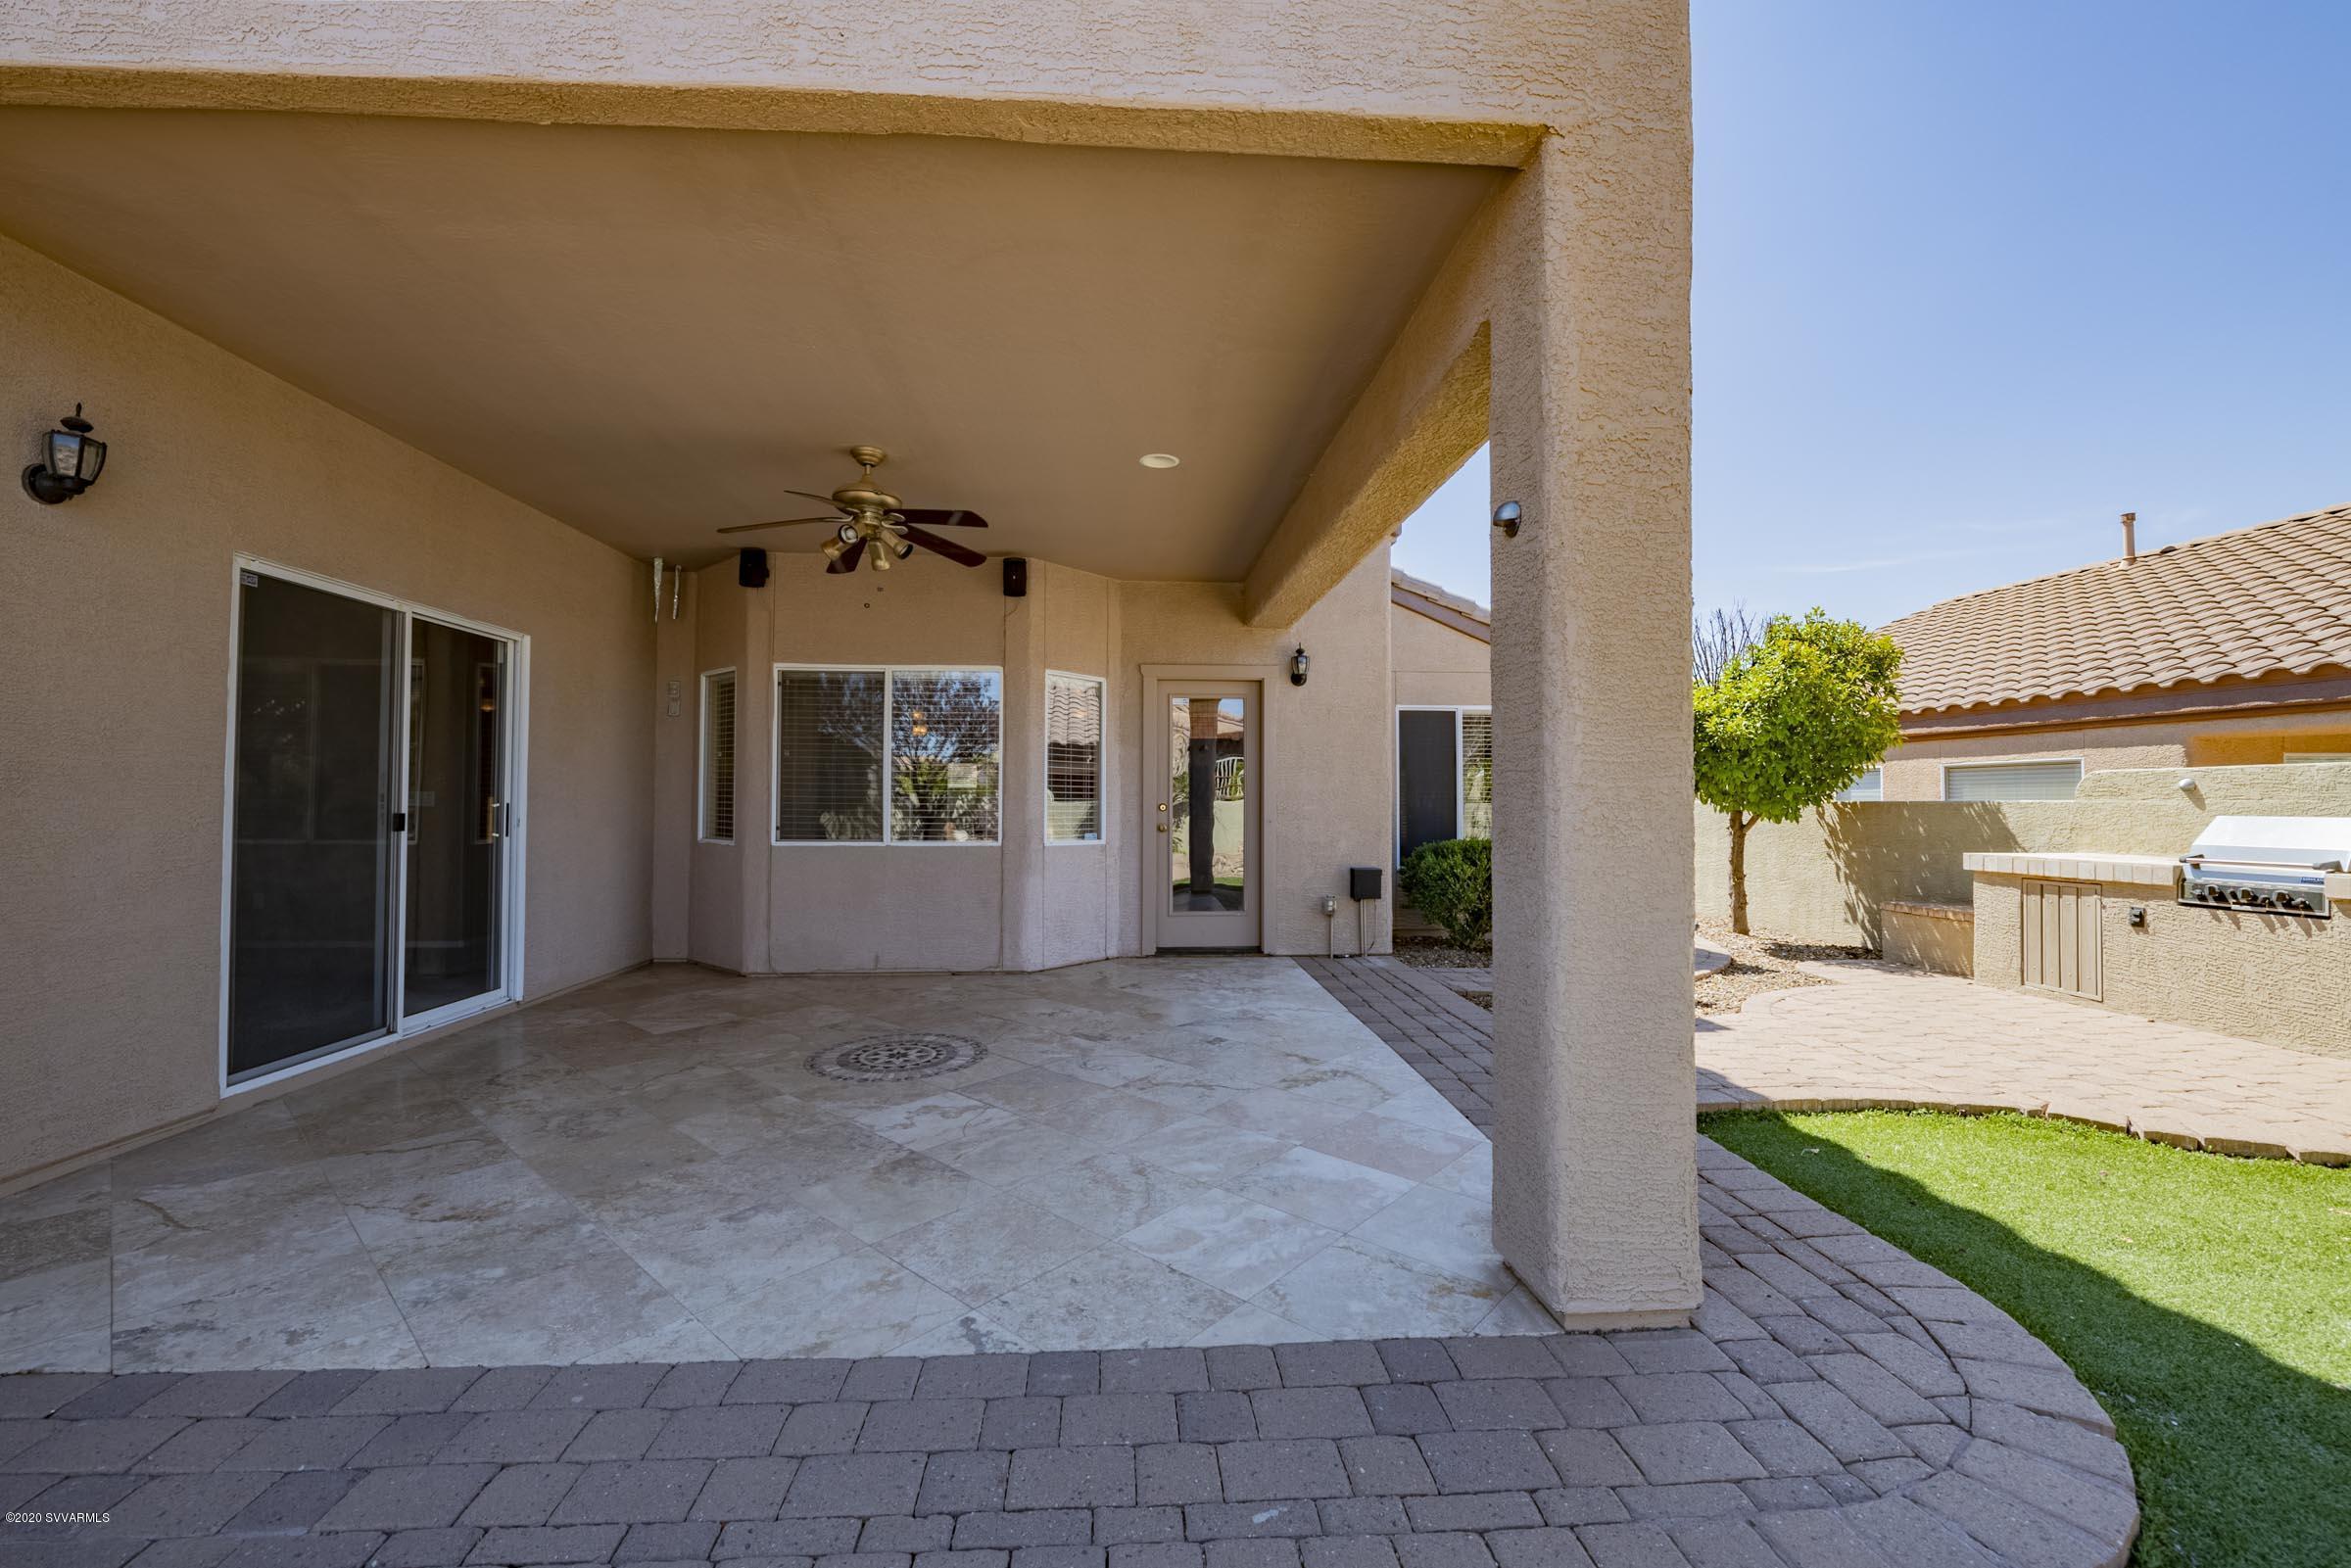 660 S Santa Fe Tr Cornville, AZ 86325